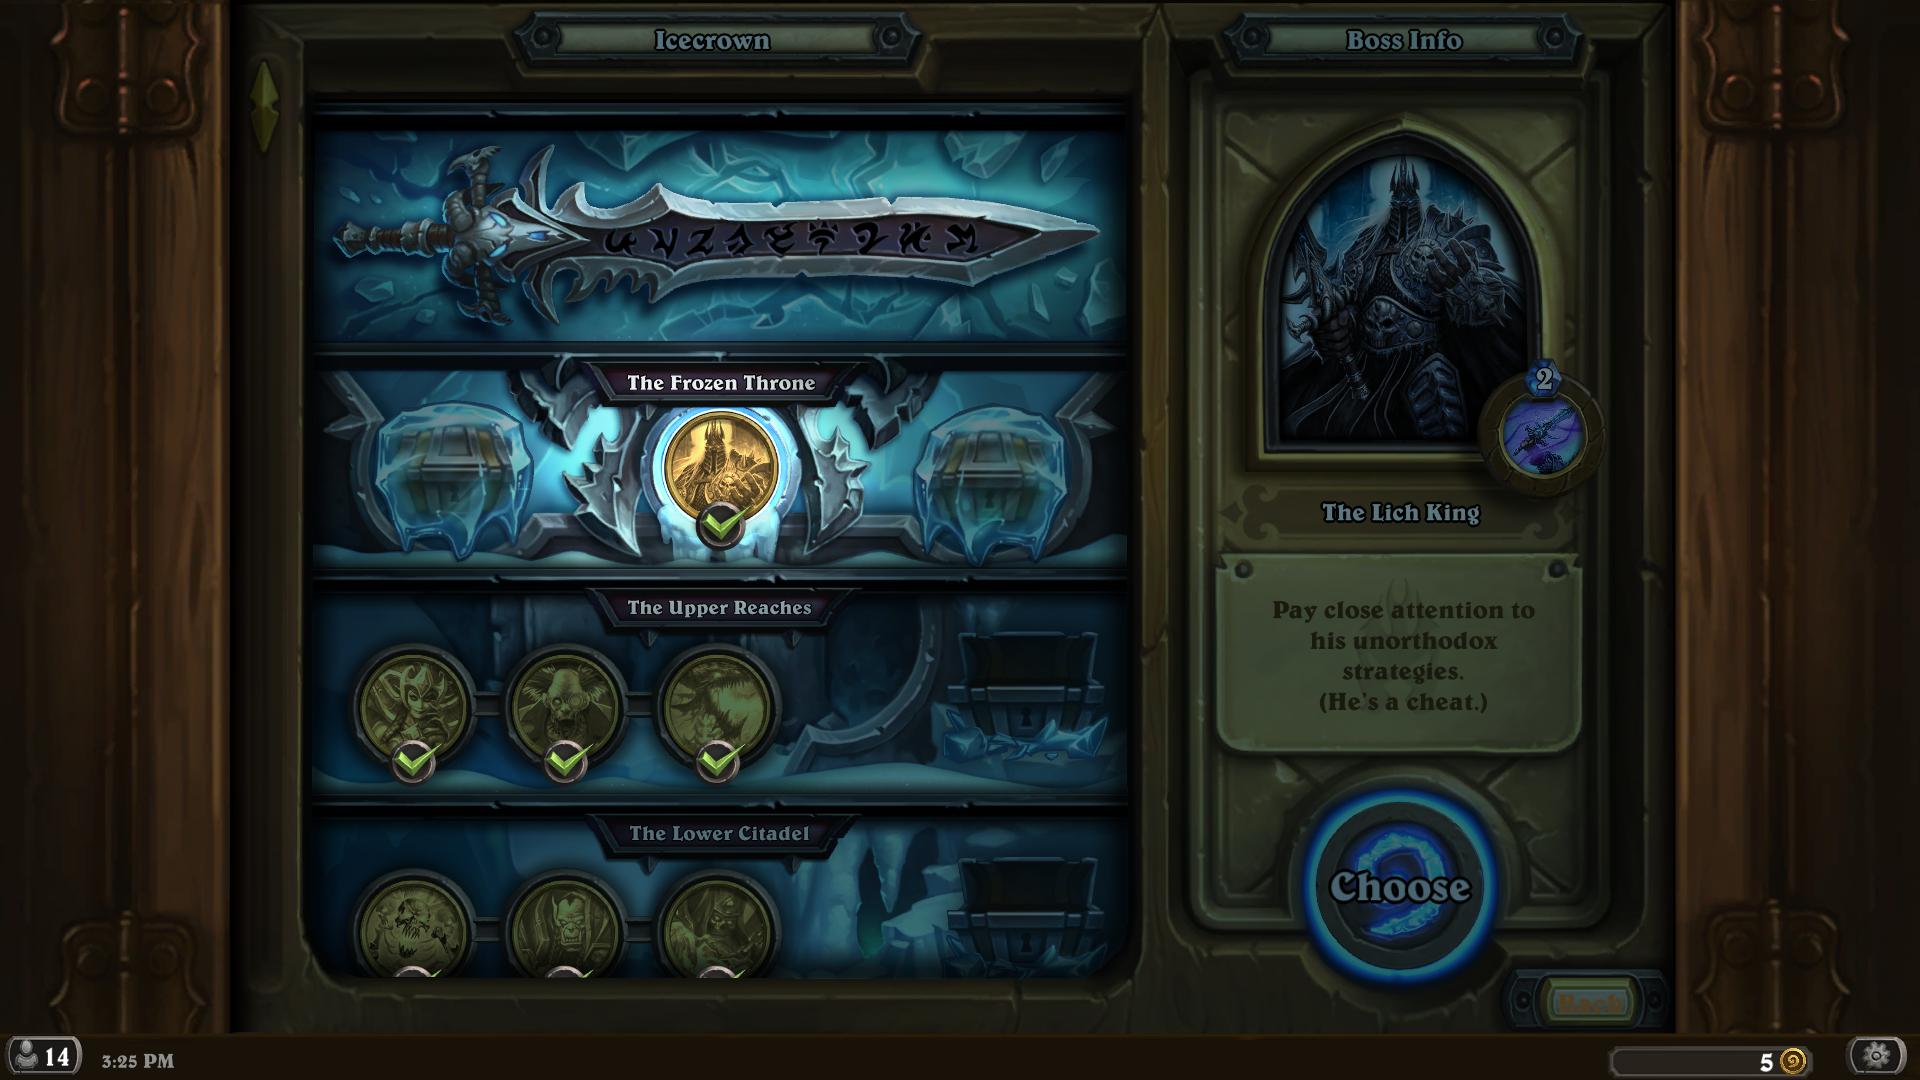 The Lich King Boss Guide The Frozen Throne Frozen